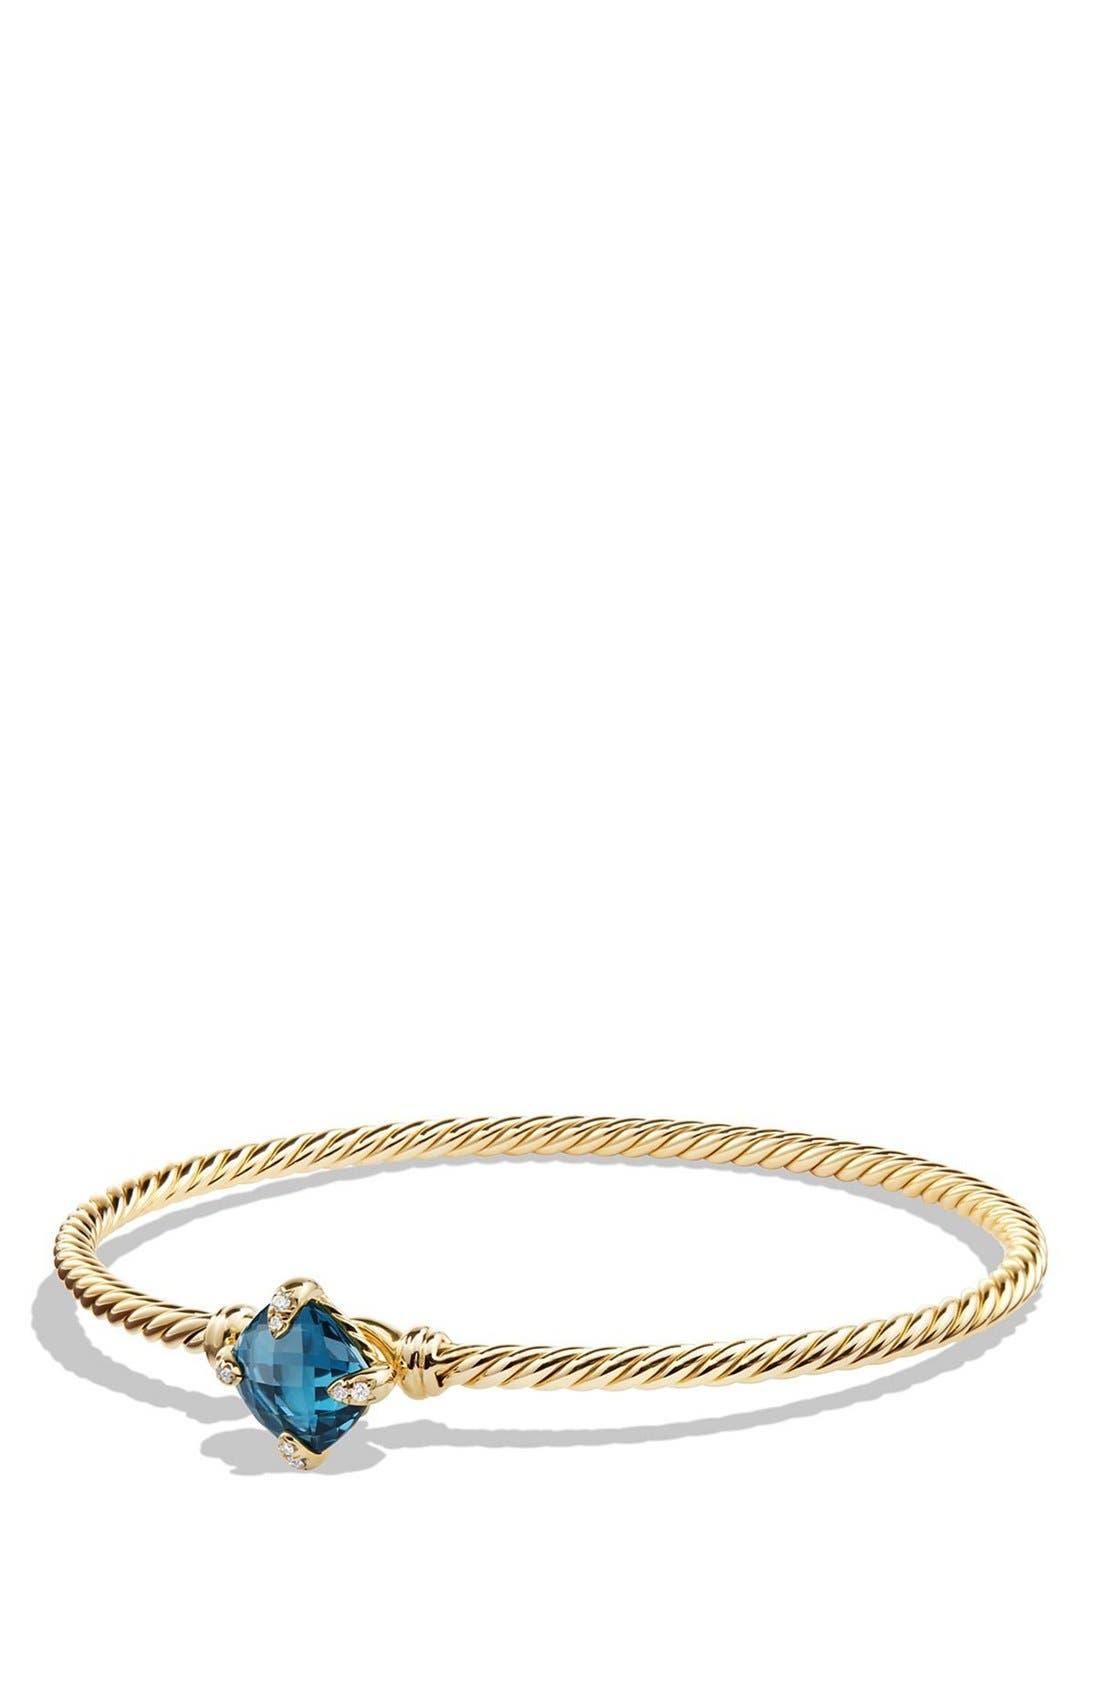 Main Image - David Yurman 'Châtelaine' Bracelet in 18K Gold with Diamonds